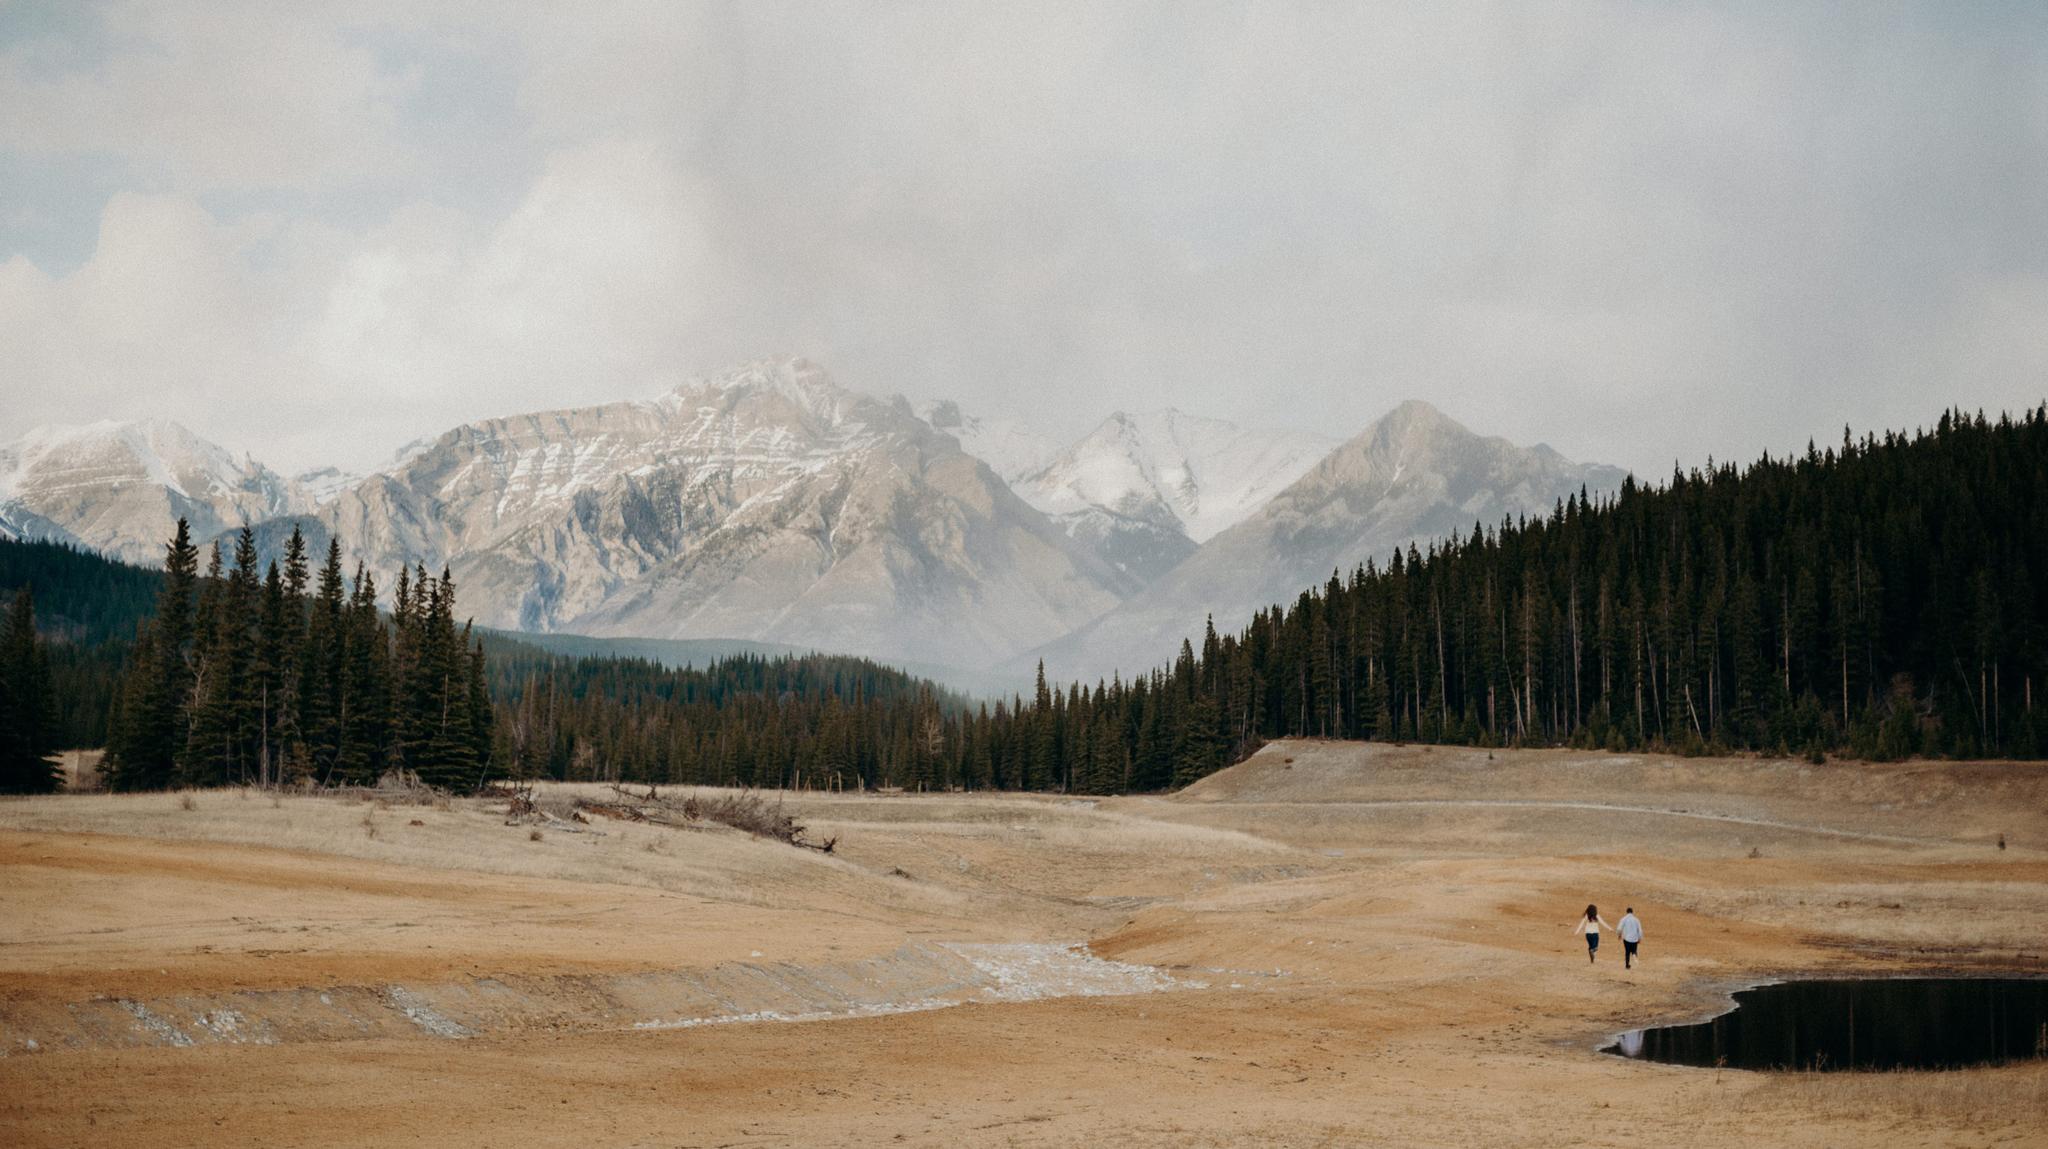 Adventurous Banff Engagement Shoot